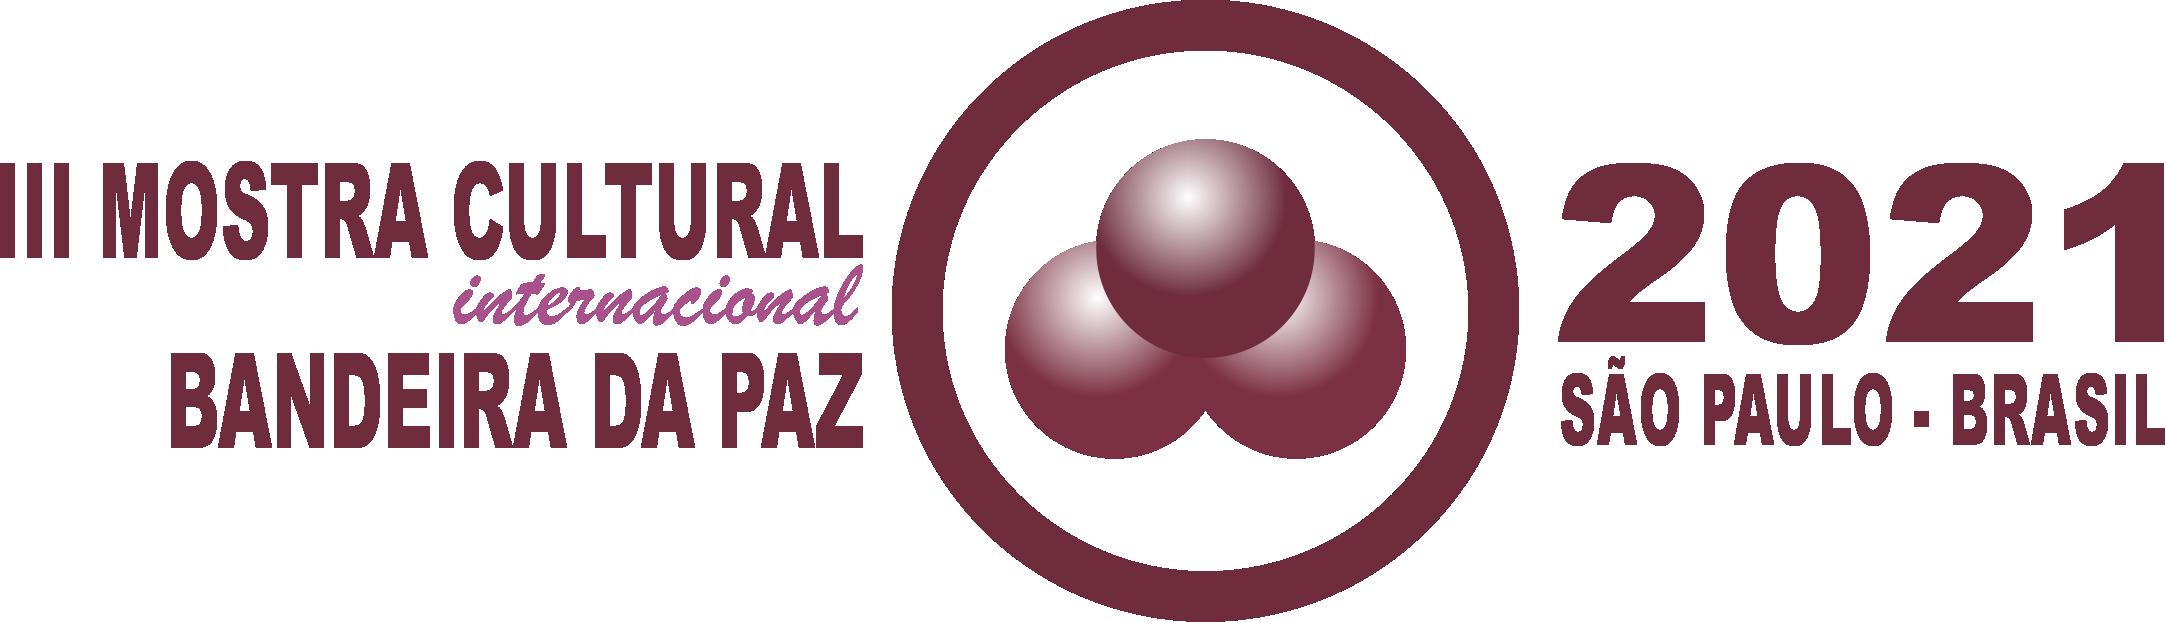 Logo MOSTRA CULTURAL 2021_SAO PAULO BRASIL